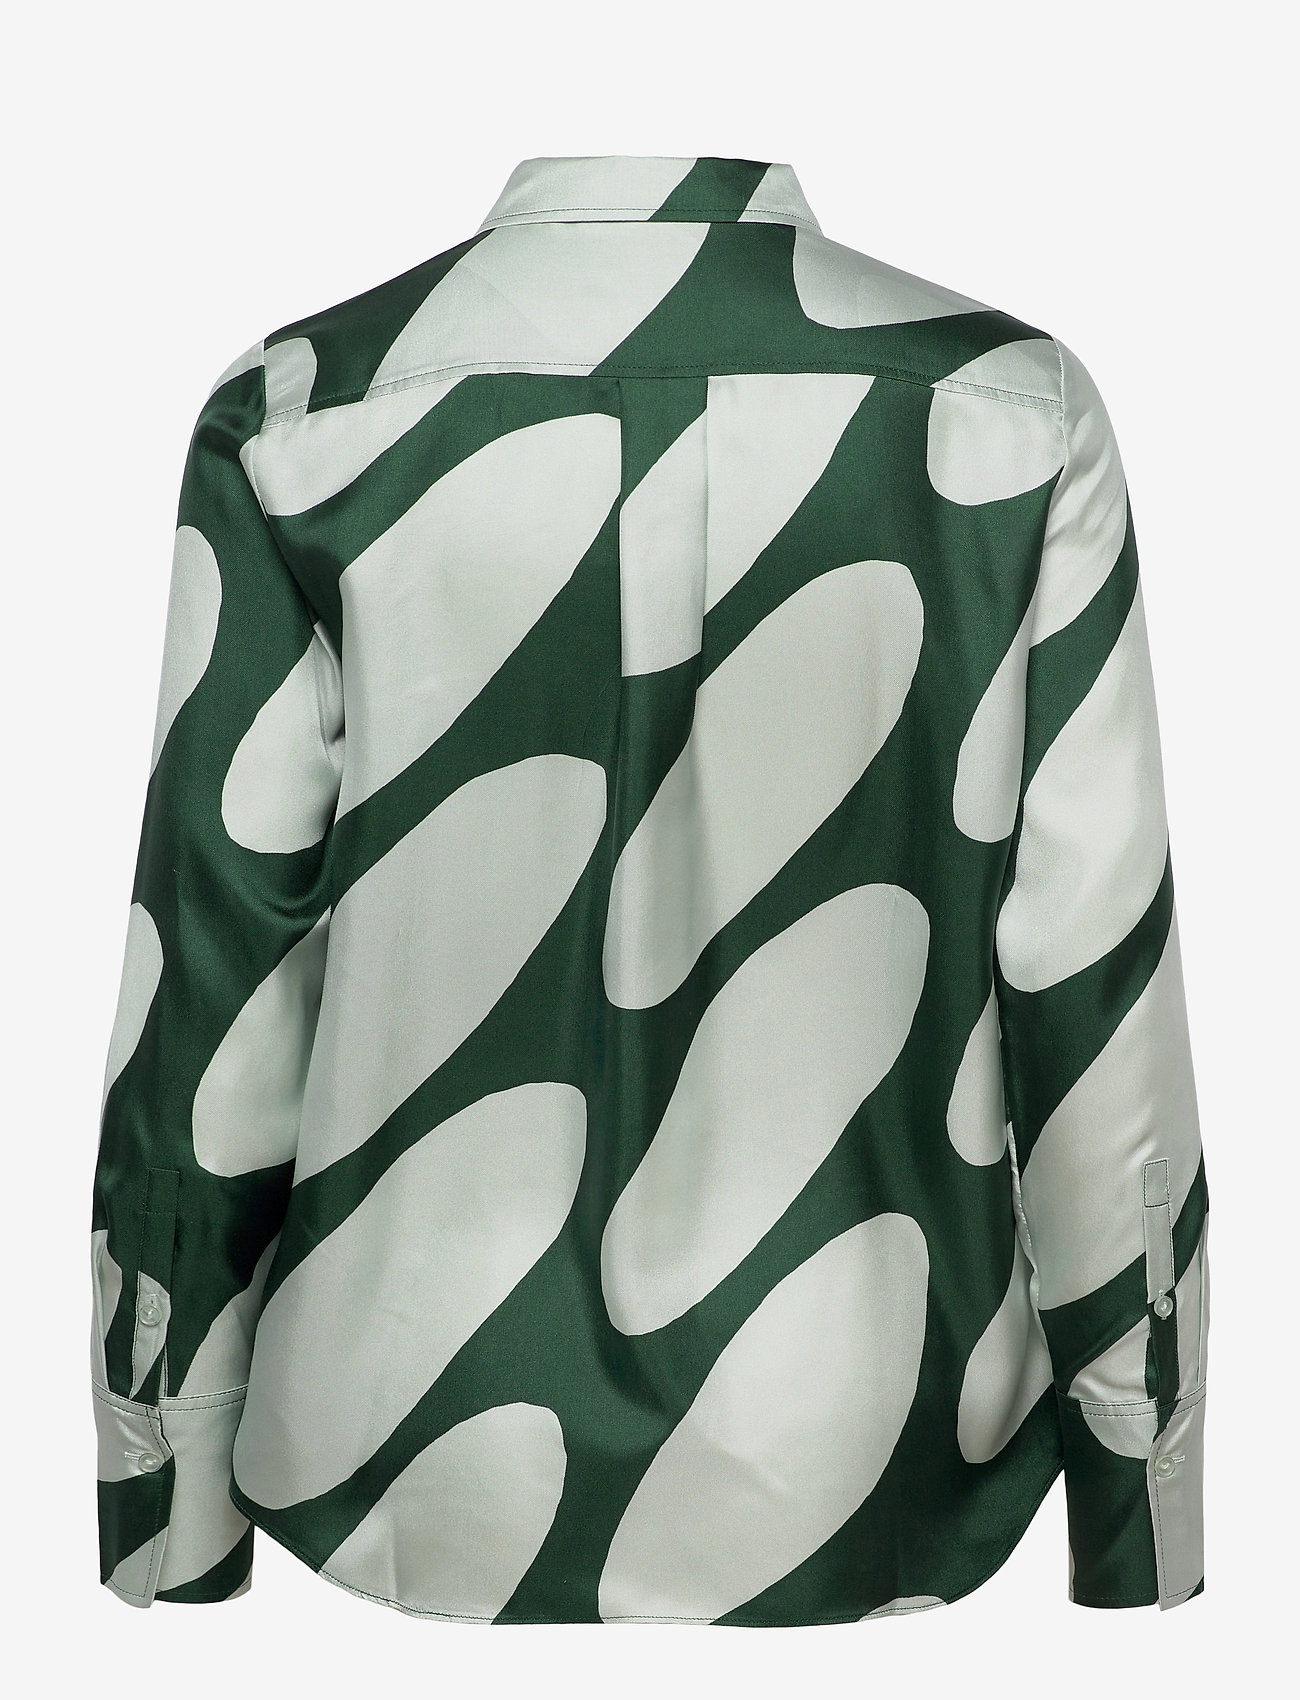 Marimekko - TOIVEIKAS LINSSI SHIRT - langærmede skjorter - light green, dark green - 1